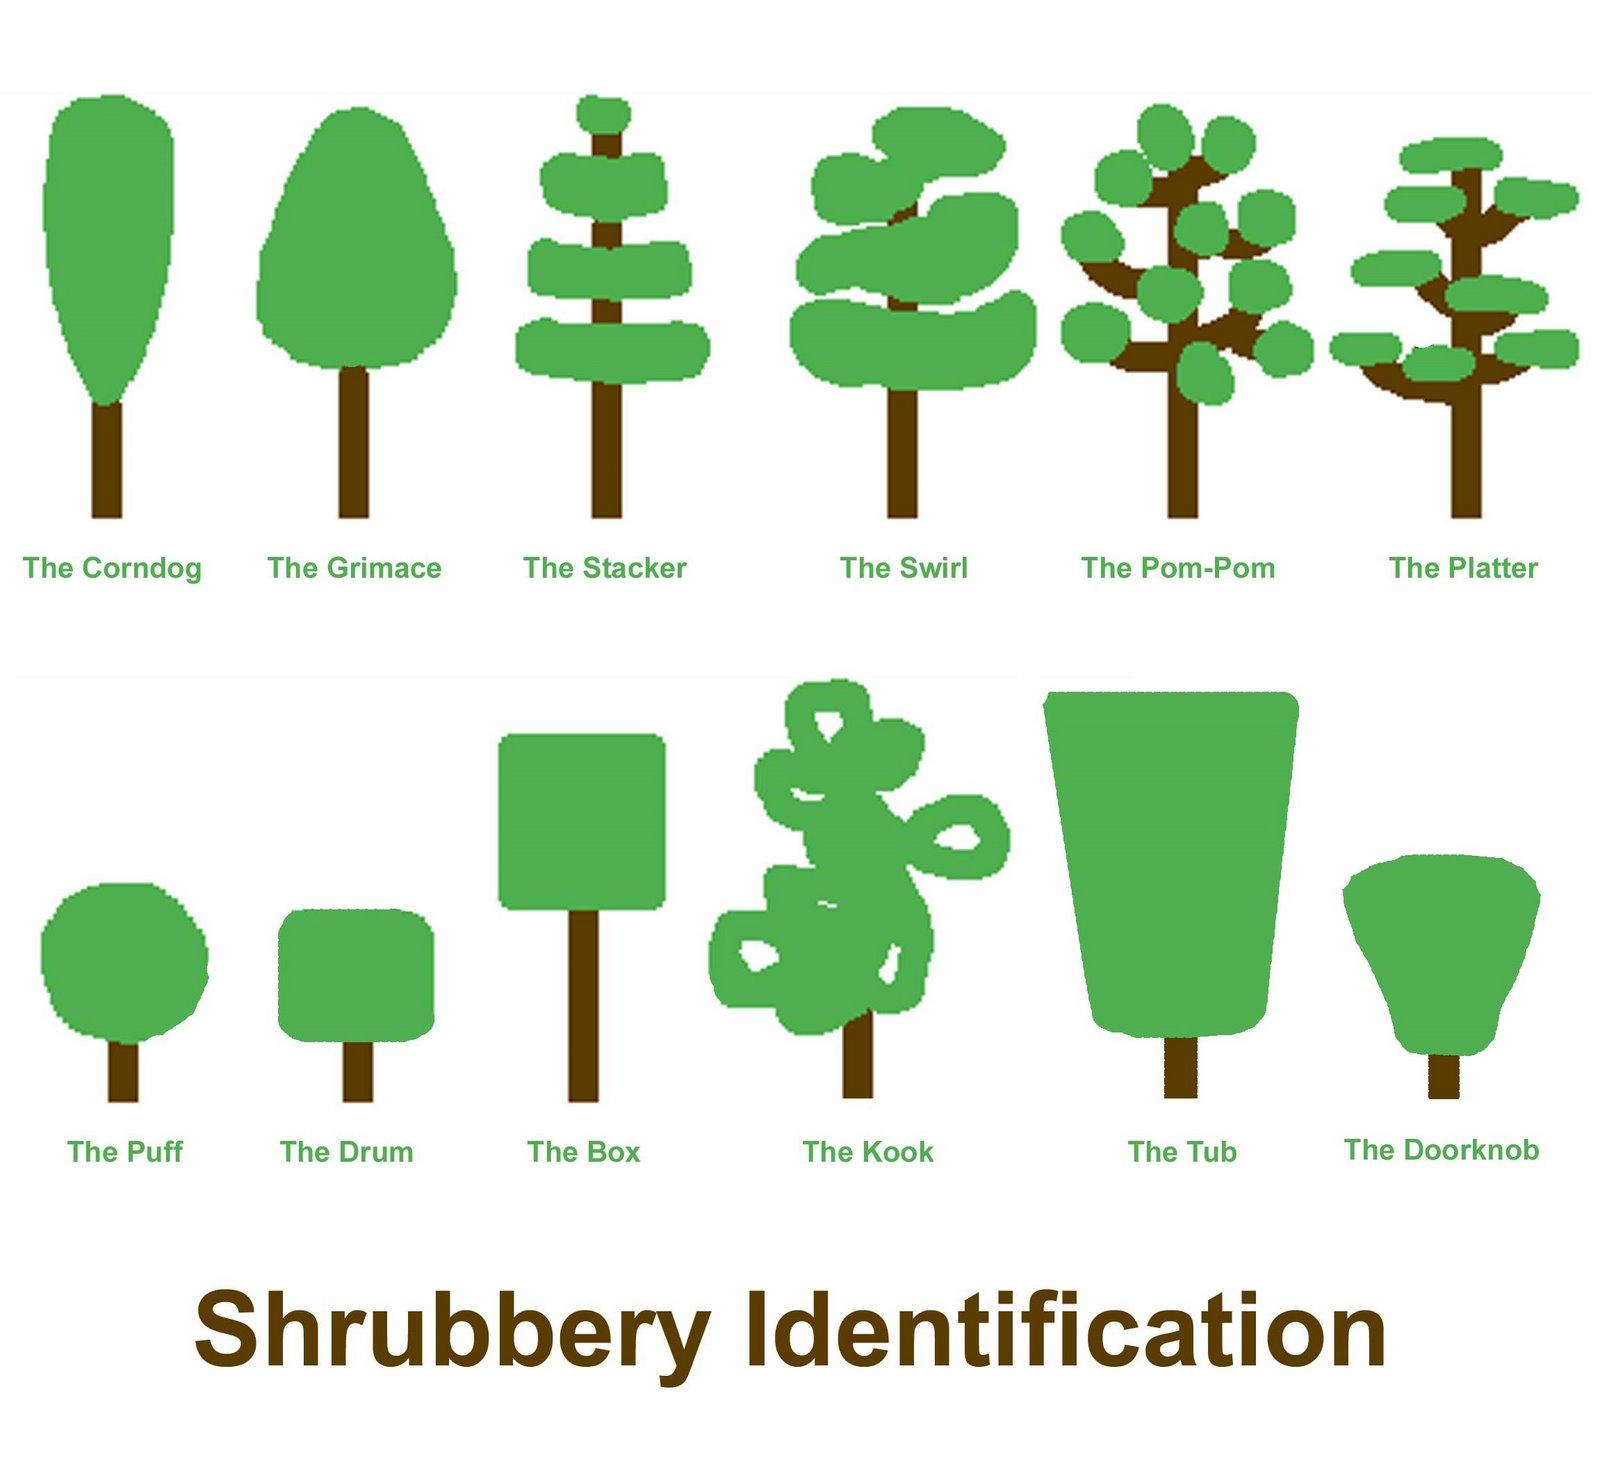 shrubberies